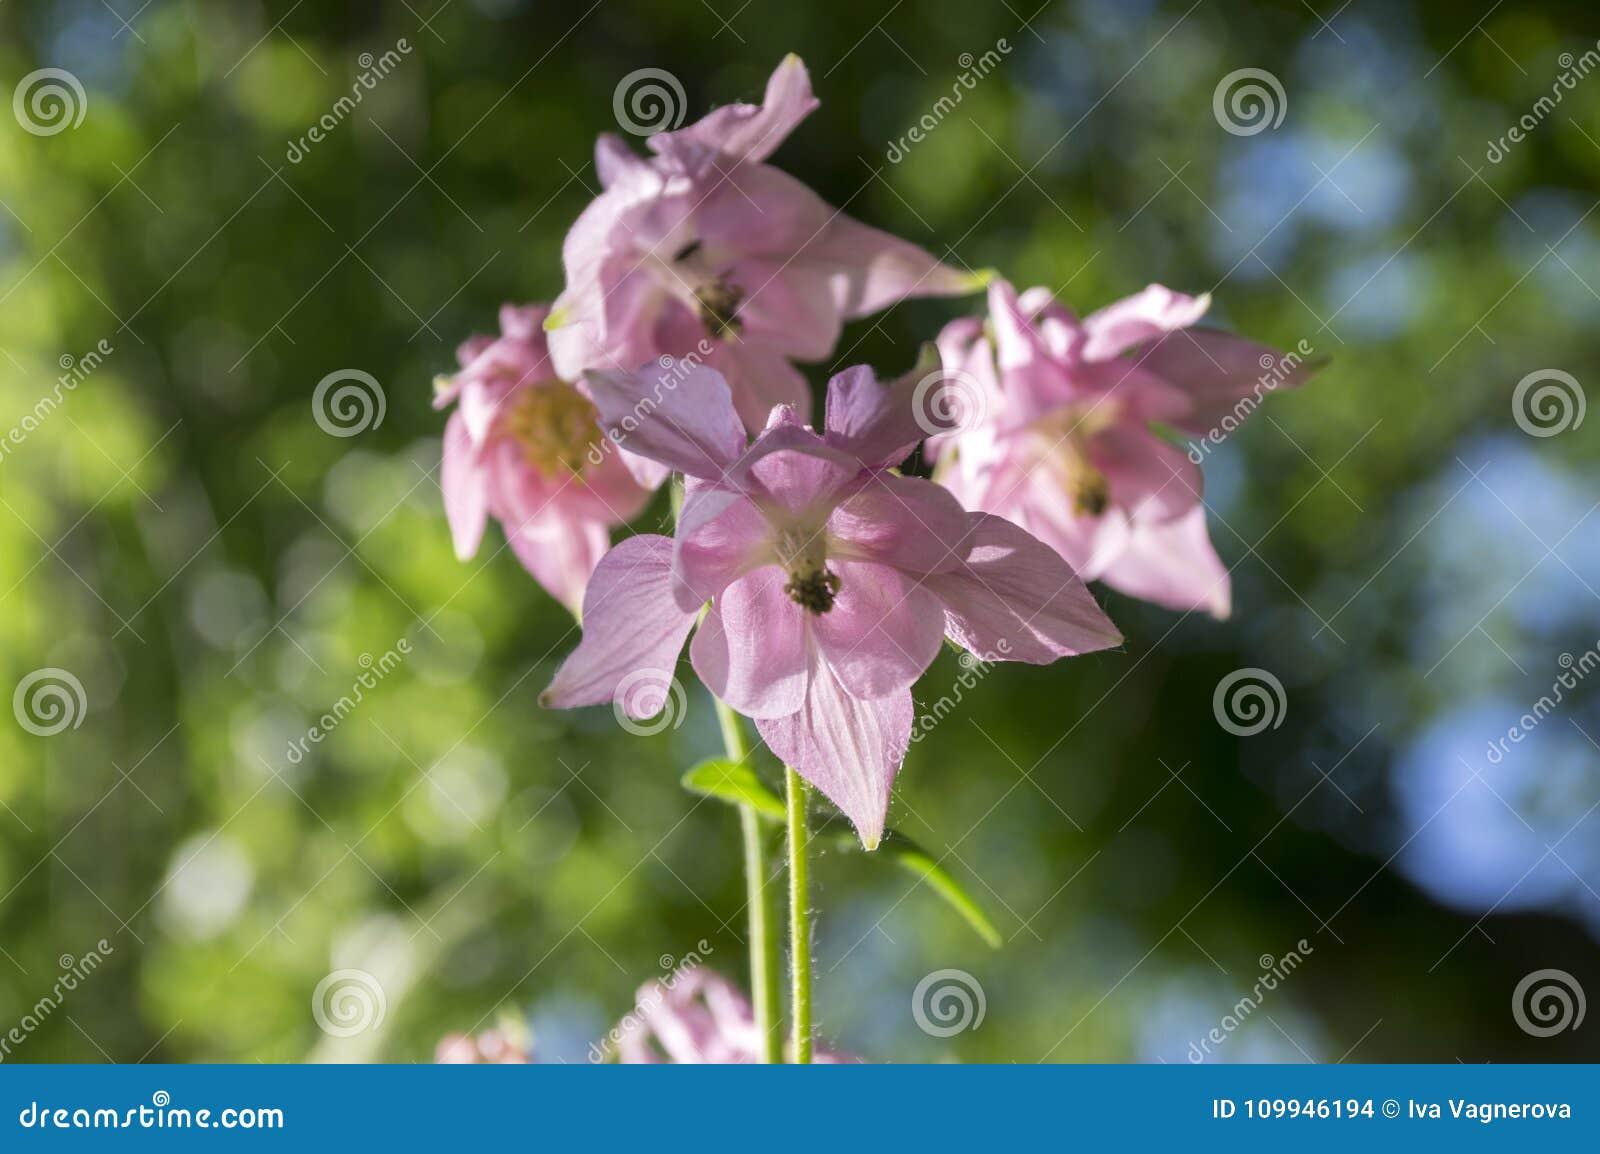 Aquilegia Vulgaris Common Columbine Pink Flowers In Bloom Stock